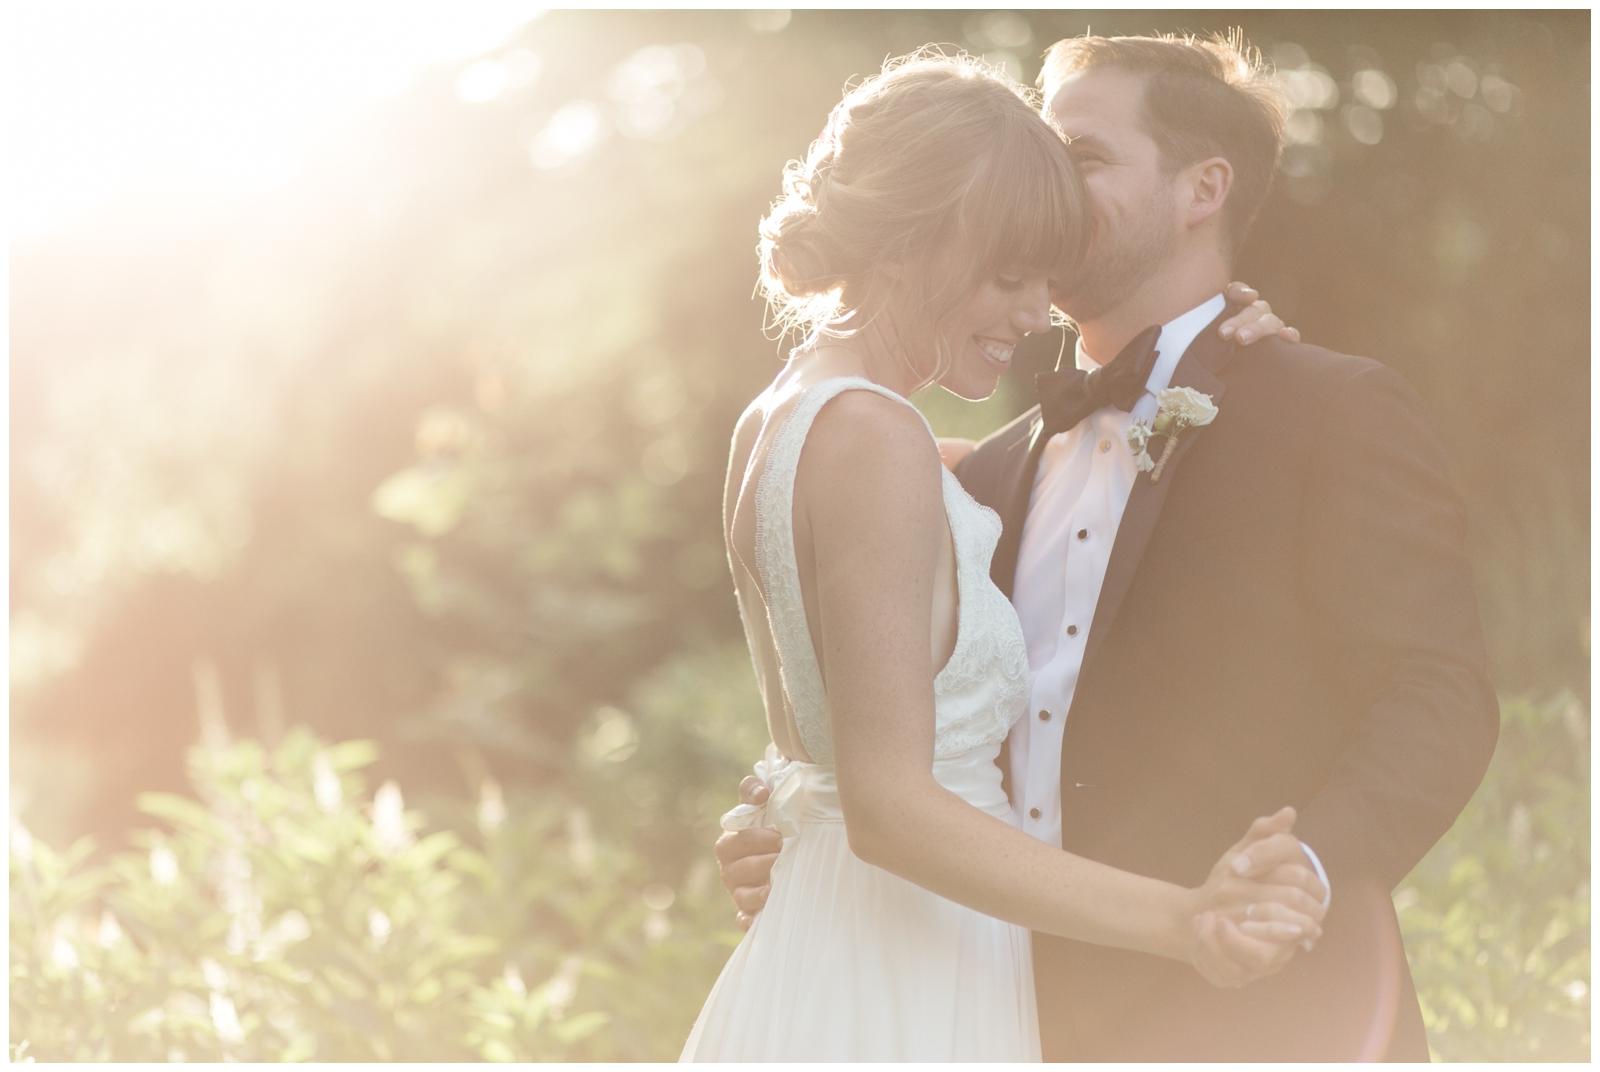 Moraine-Farm-wedding-Bailey-Q-Photo-Massachusetts-wedding-photpgrapher-108.jpg